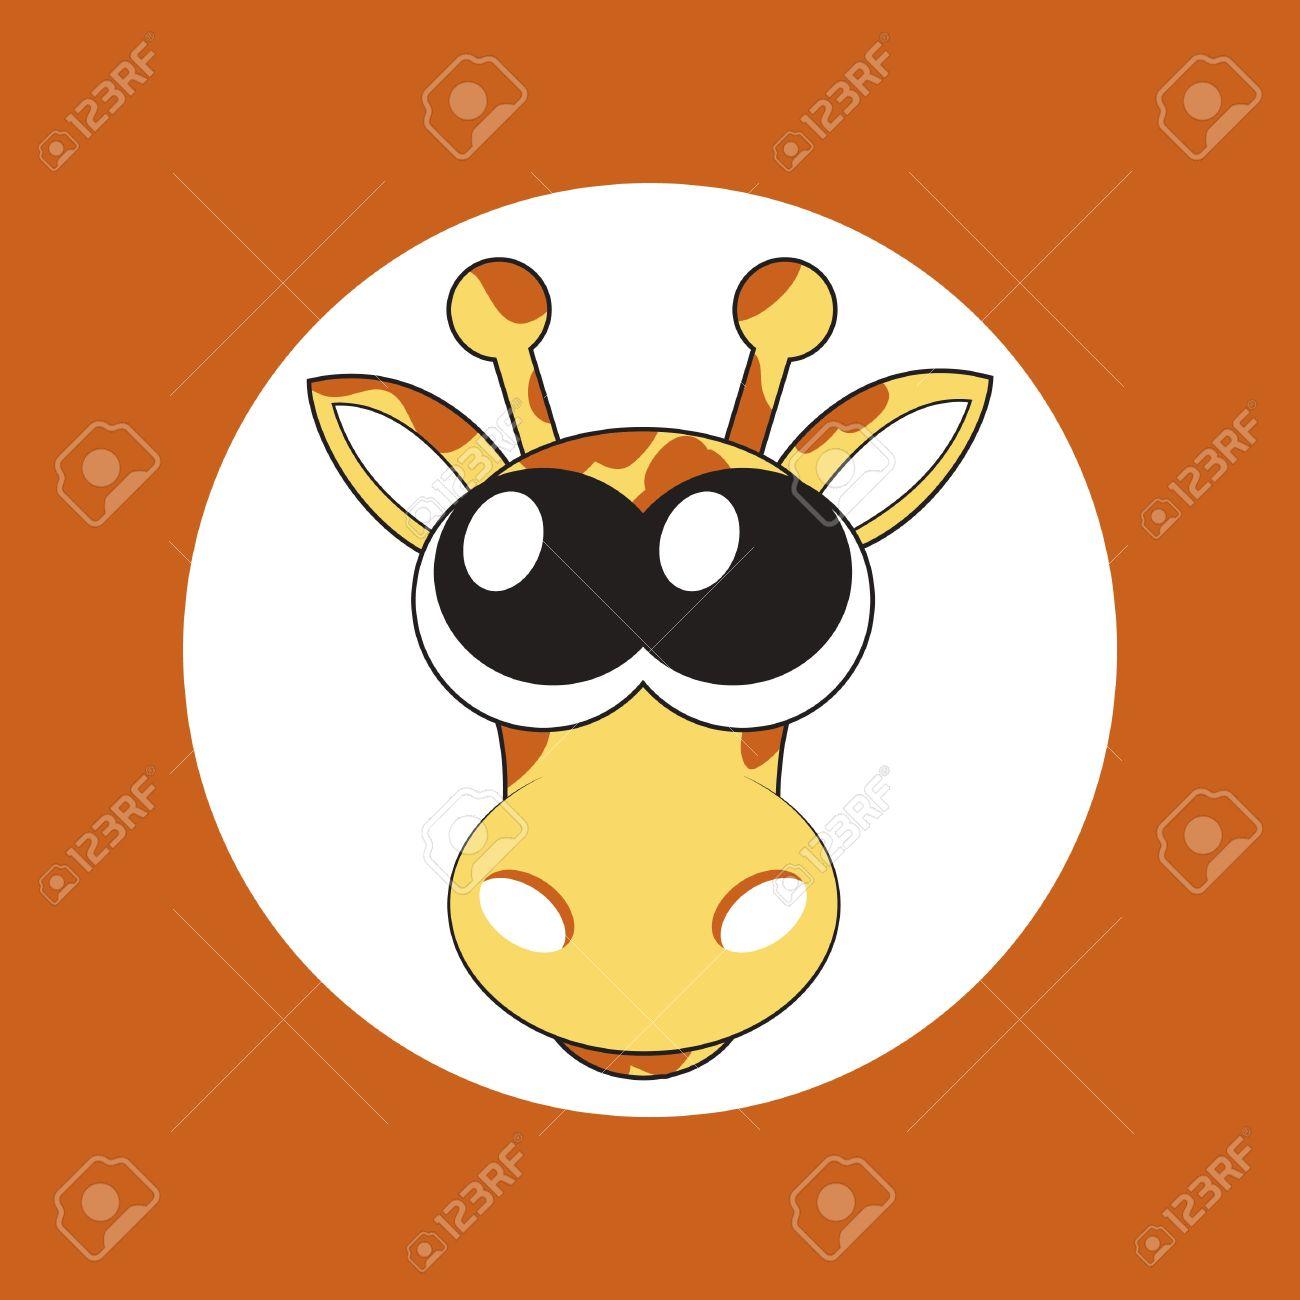 illustration of cartoon giraffe with big cute eyes Stock Vector - 12232996